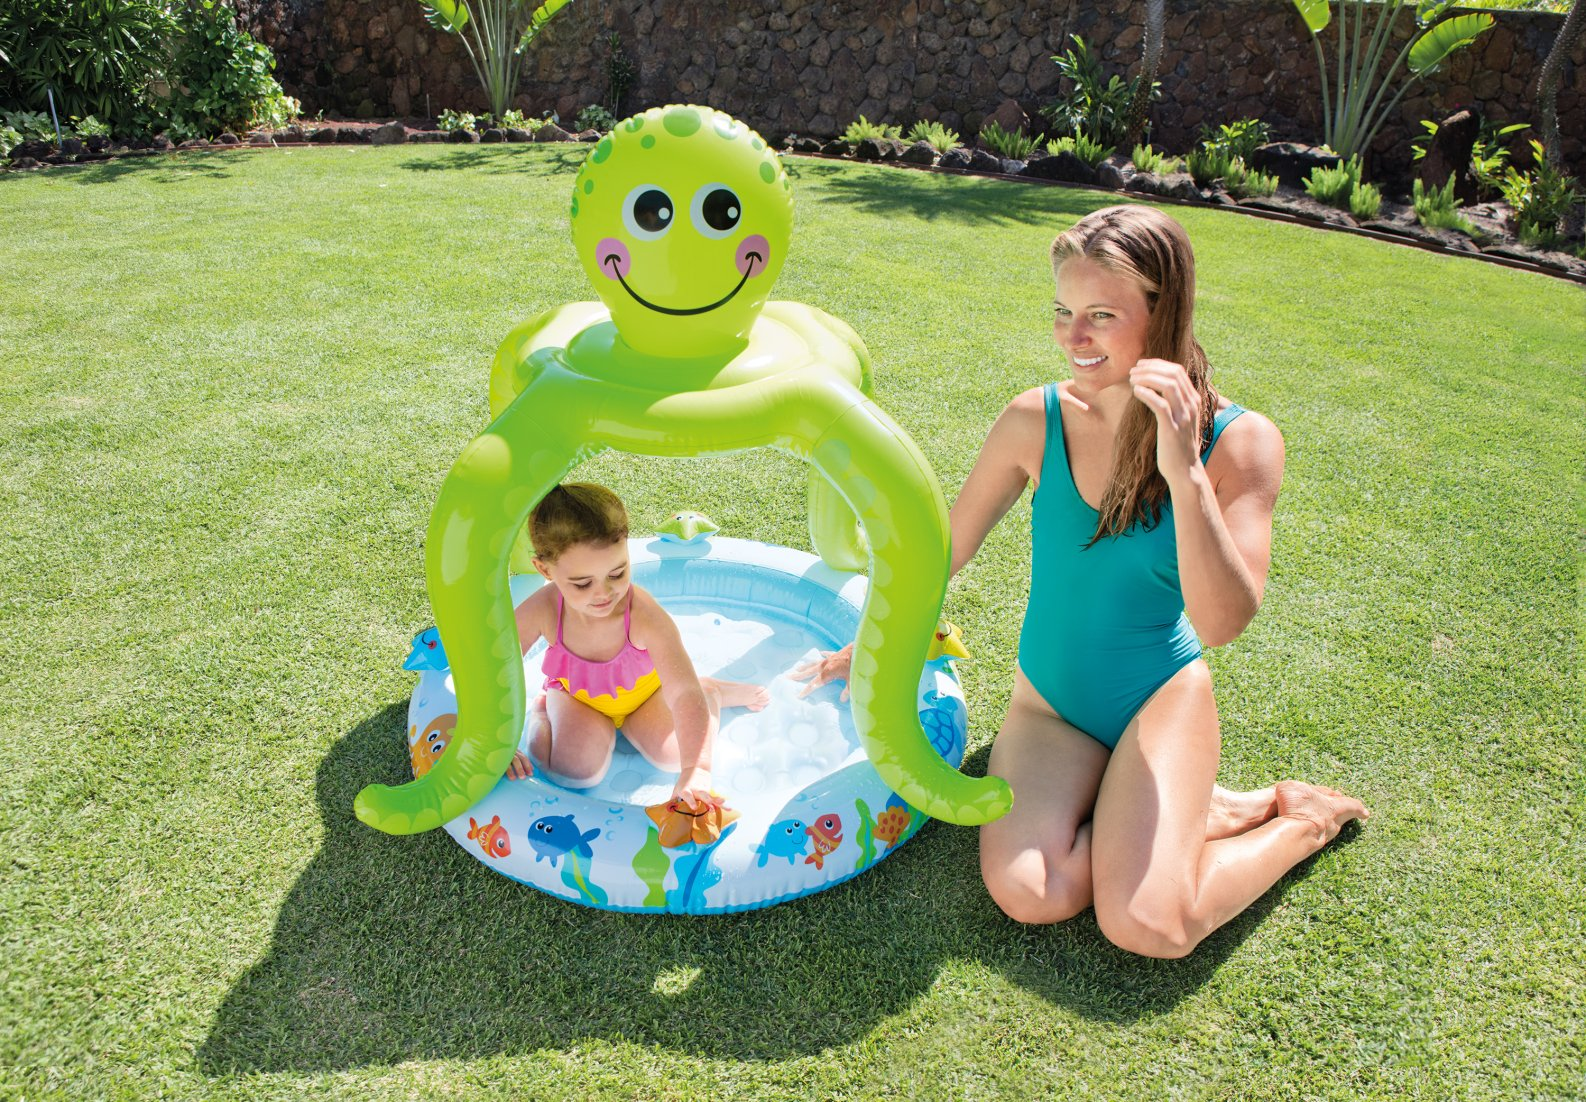 Moderno plantilla de piscina de beb cresta ejemplo de for Piscina inflable intex